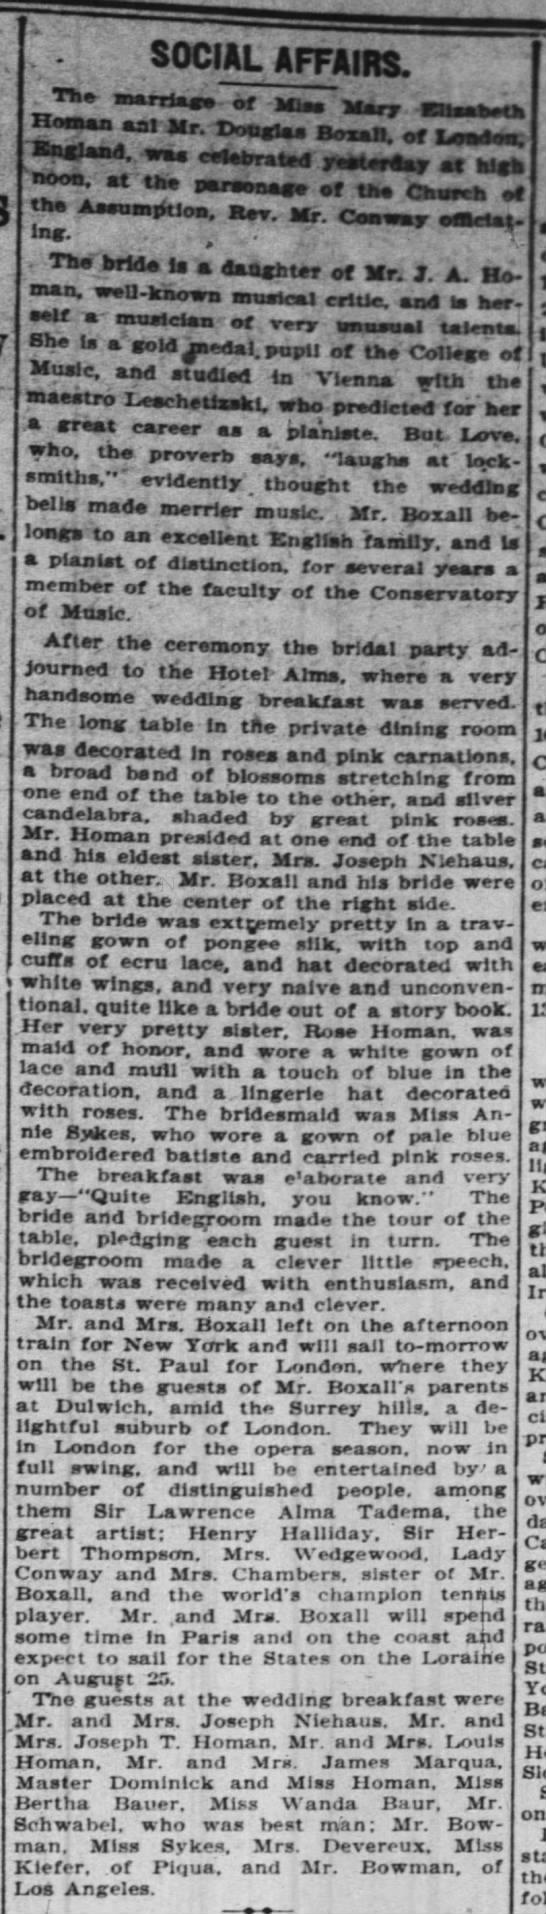 Mary Elizabeth Homan & Douglass Boxall Wedding -